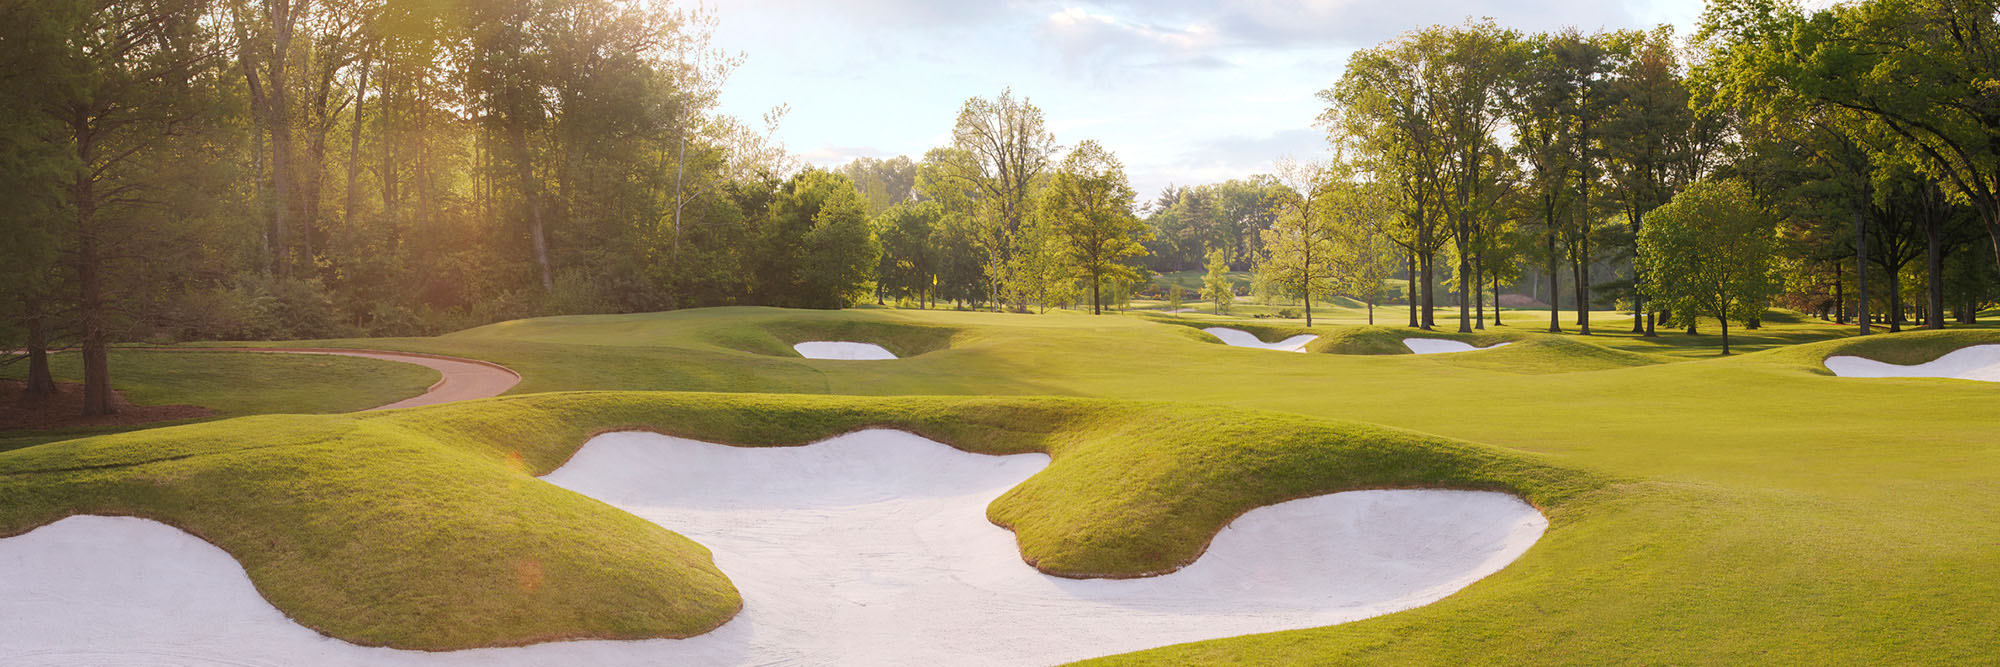 Golf Course Image - Bellerive No. 7